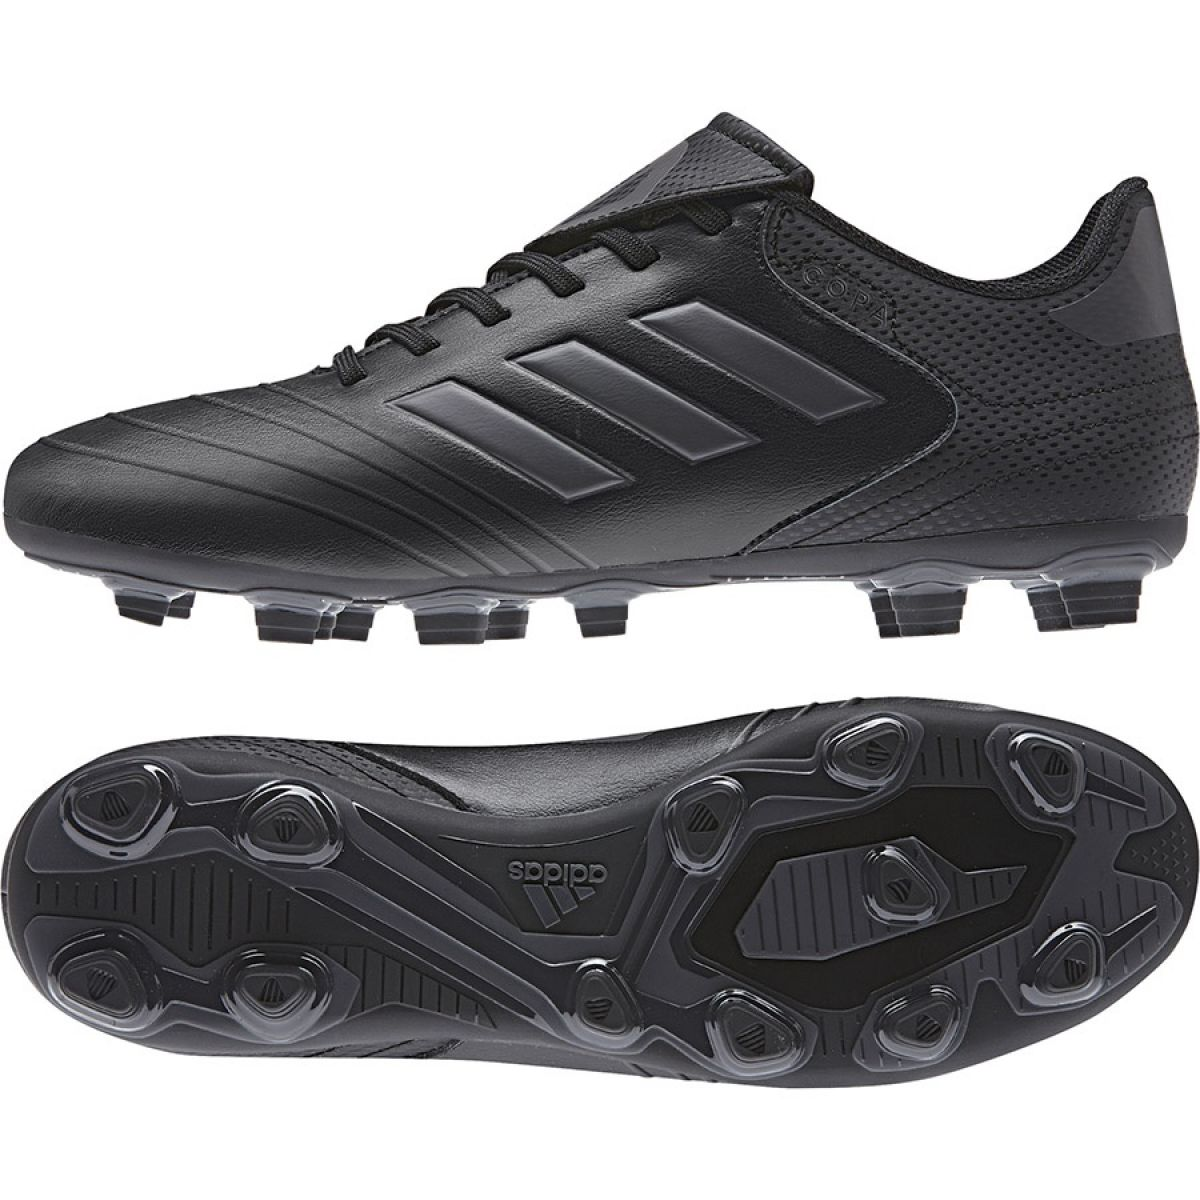 designer fashion 6477a 9b7cc Buty piłkarskie adidas Copa 18.4 FxG M CP8961 46 - 7287855318 - oficjalne  archiwum allegro